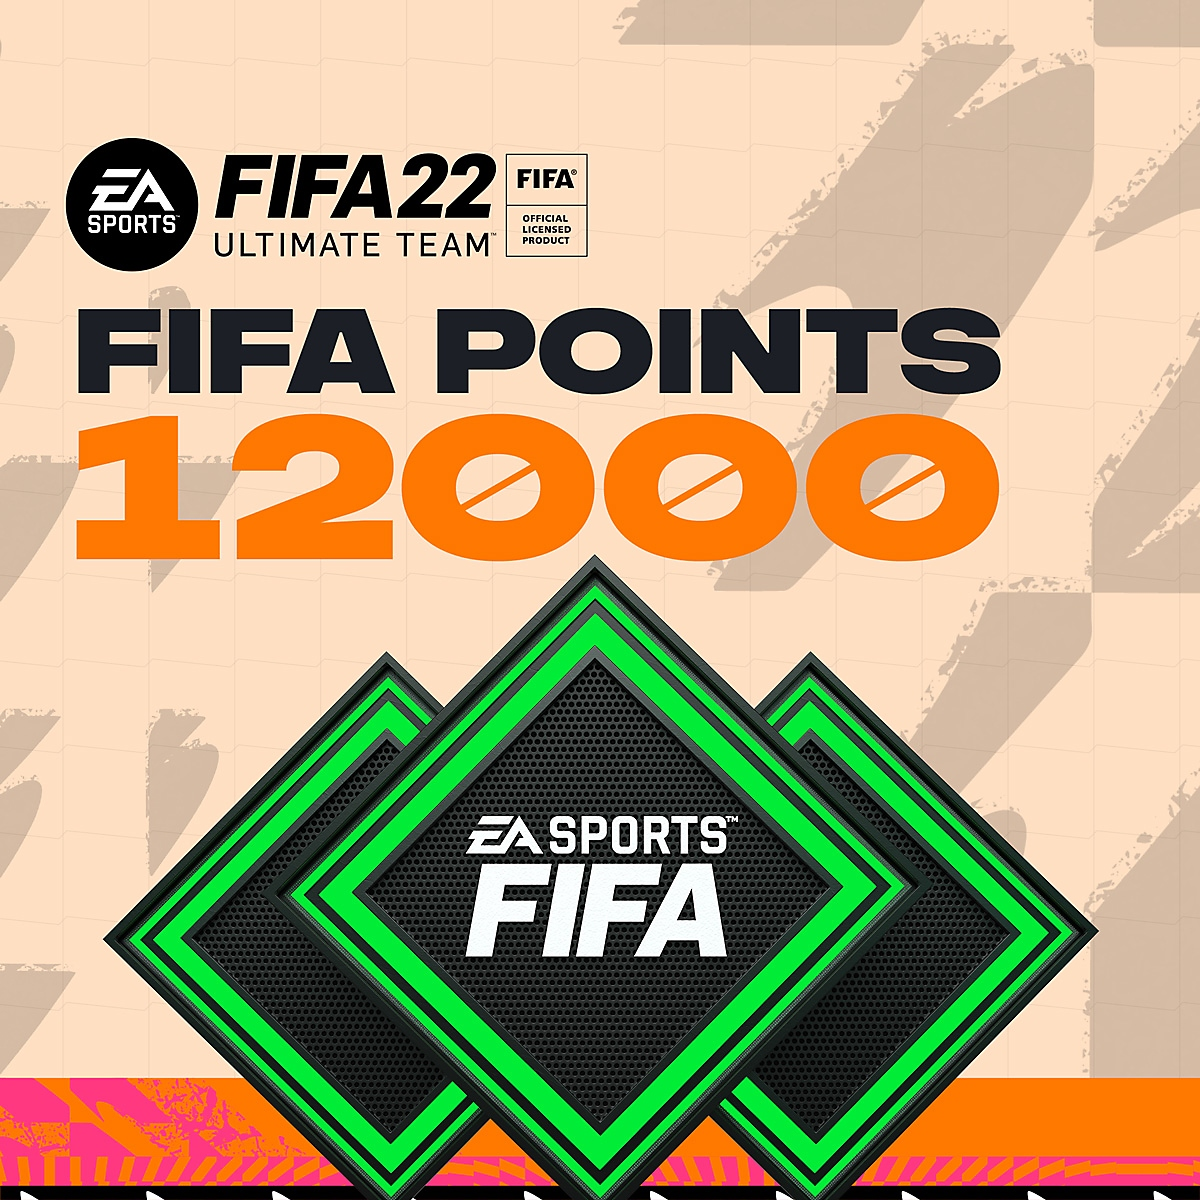 FIFA Ultimate Team - fifa points art